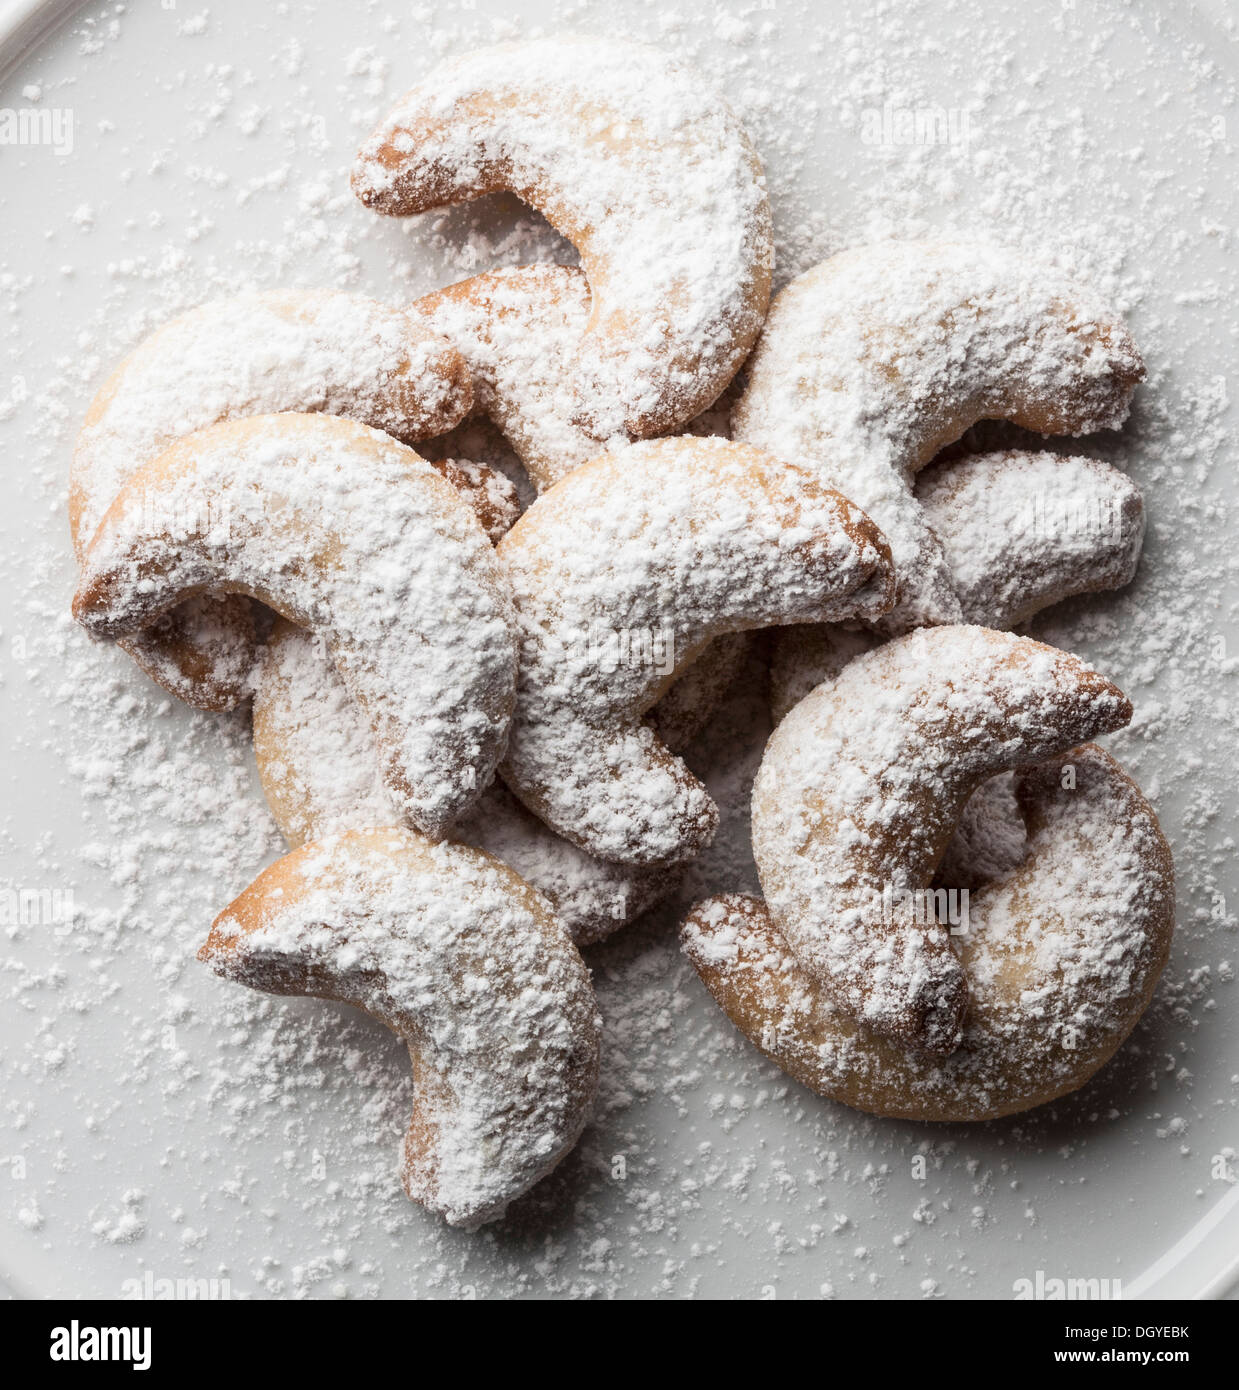 Alemán galletas de vainilla (vainilla kipferl) Imagen De Stock